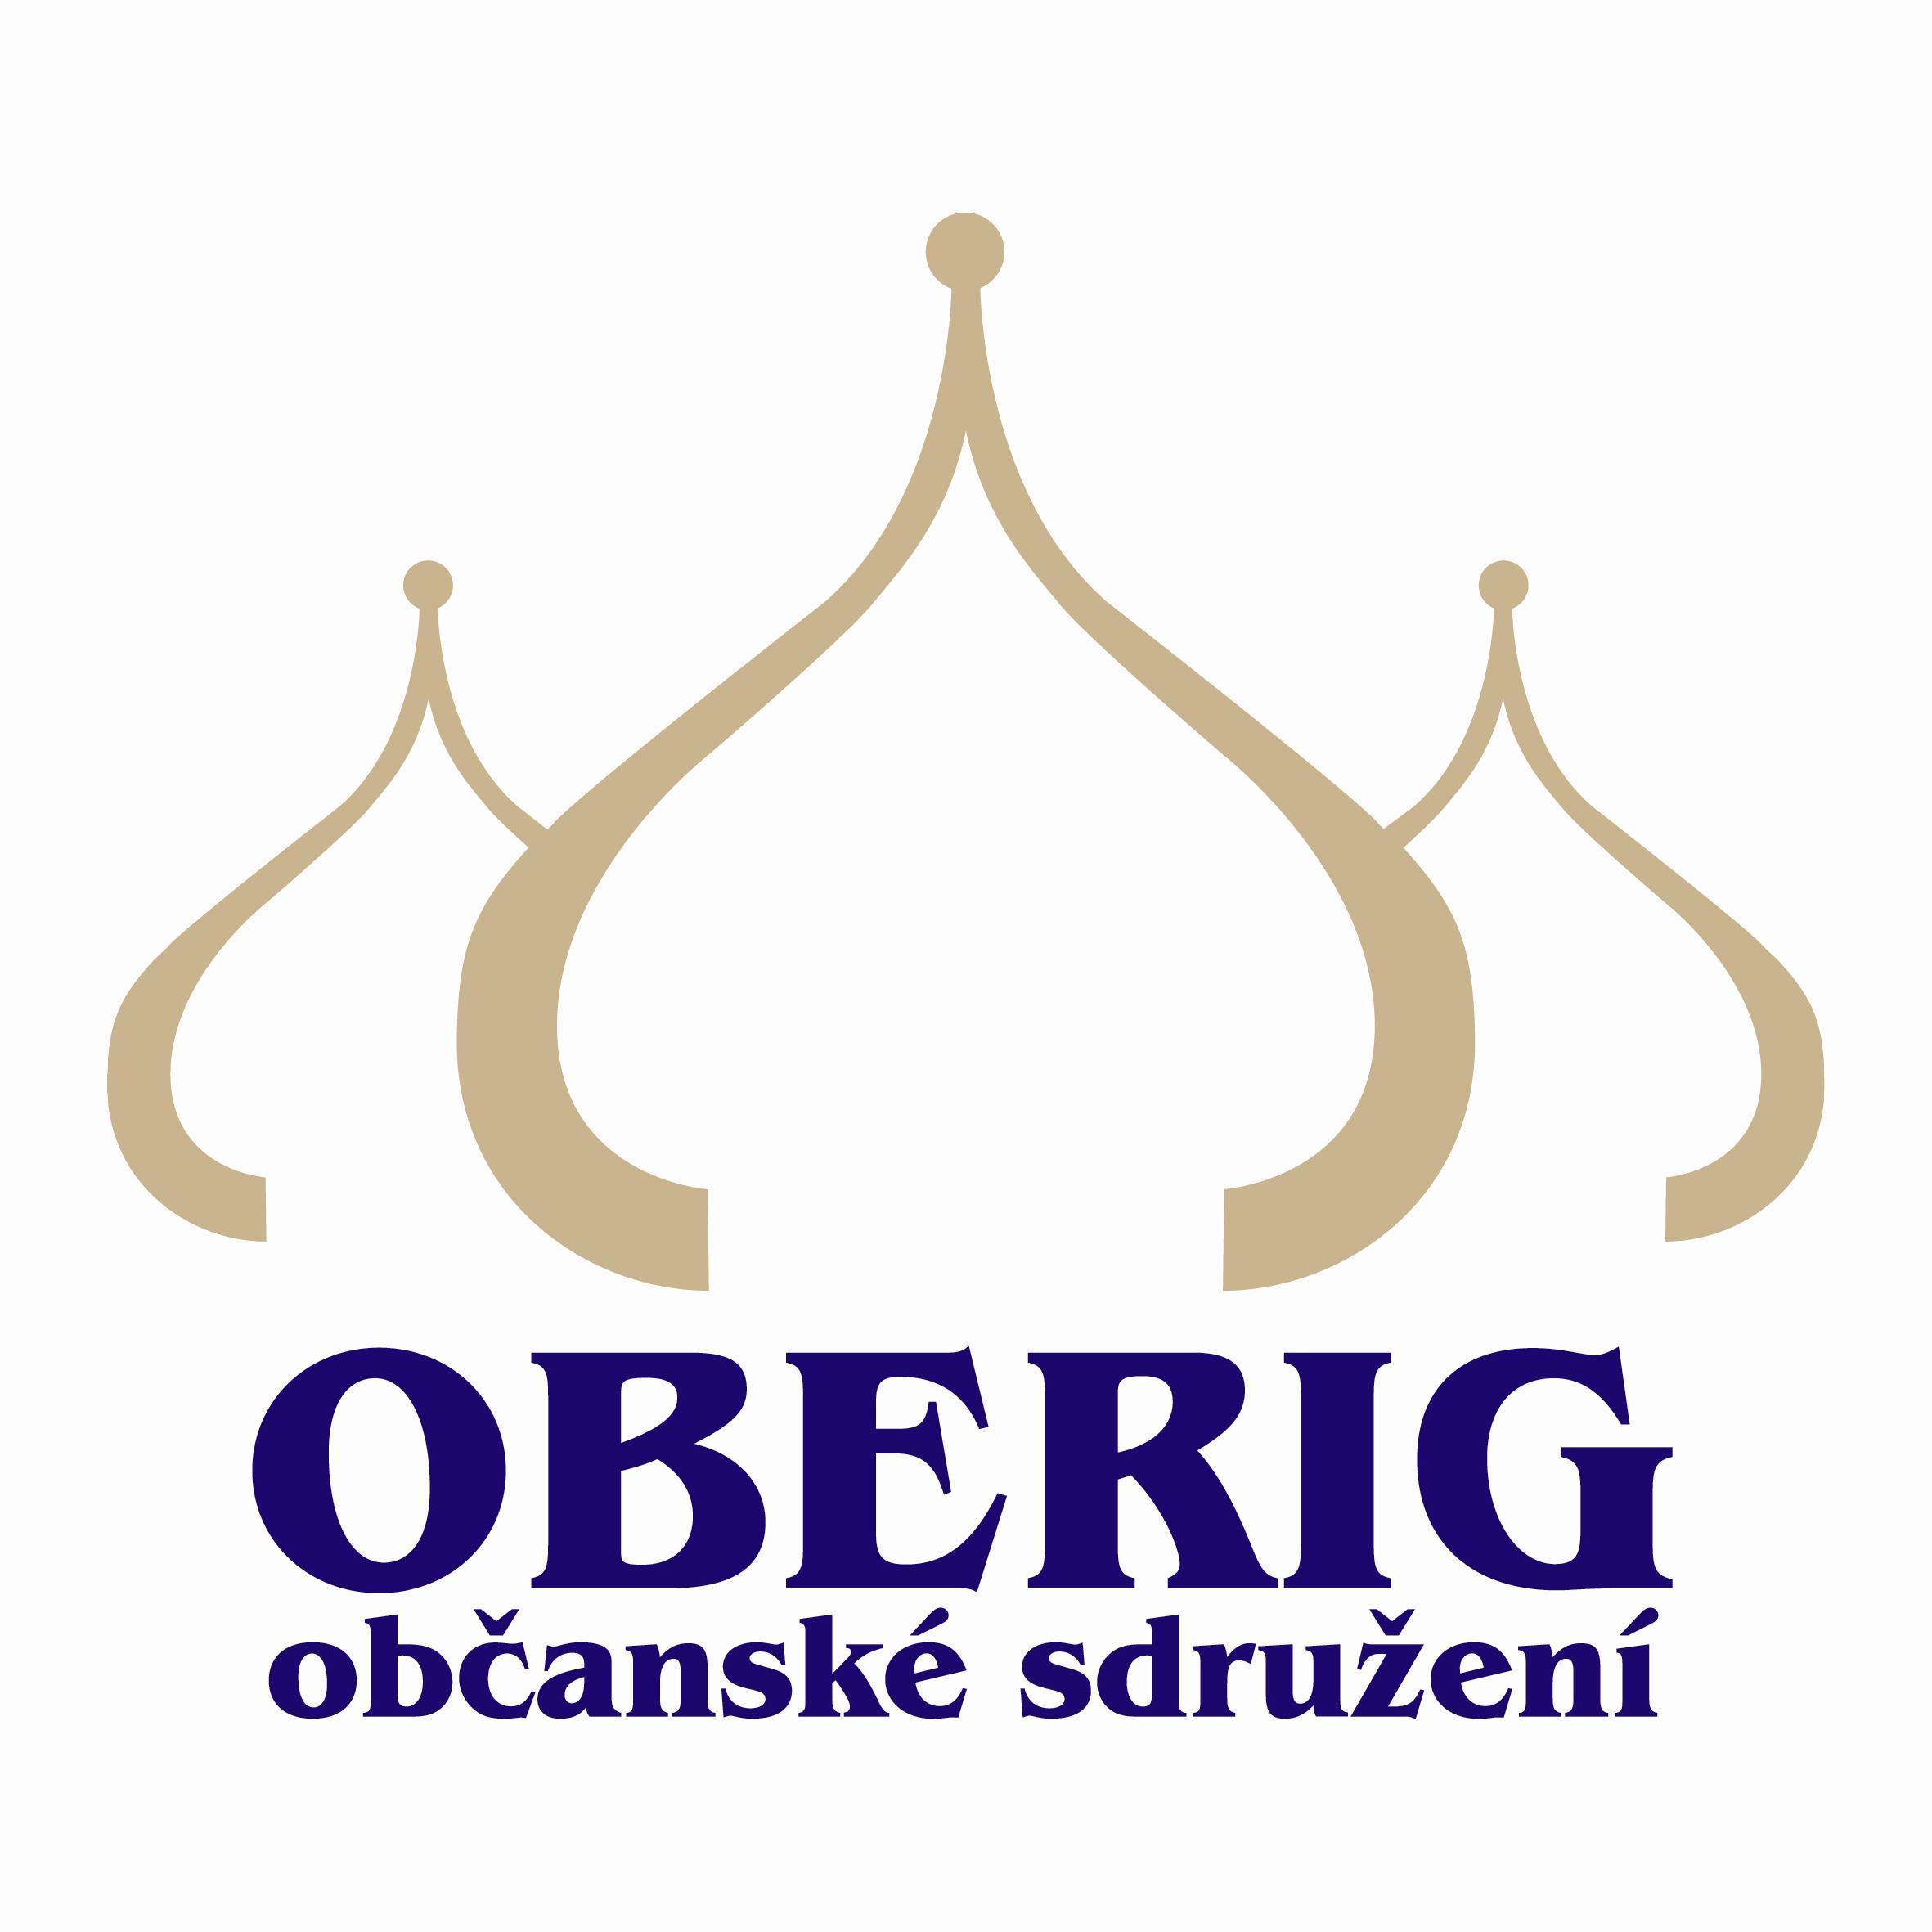 oberig_logo.jpg